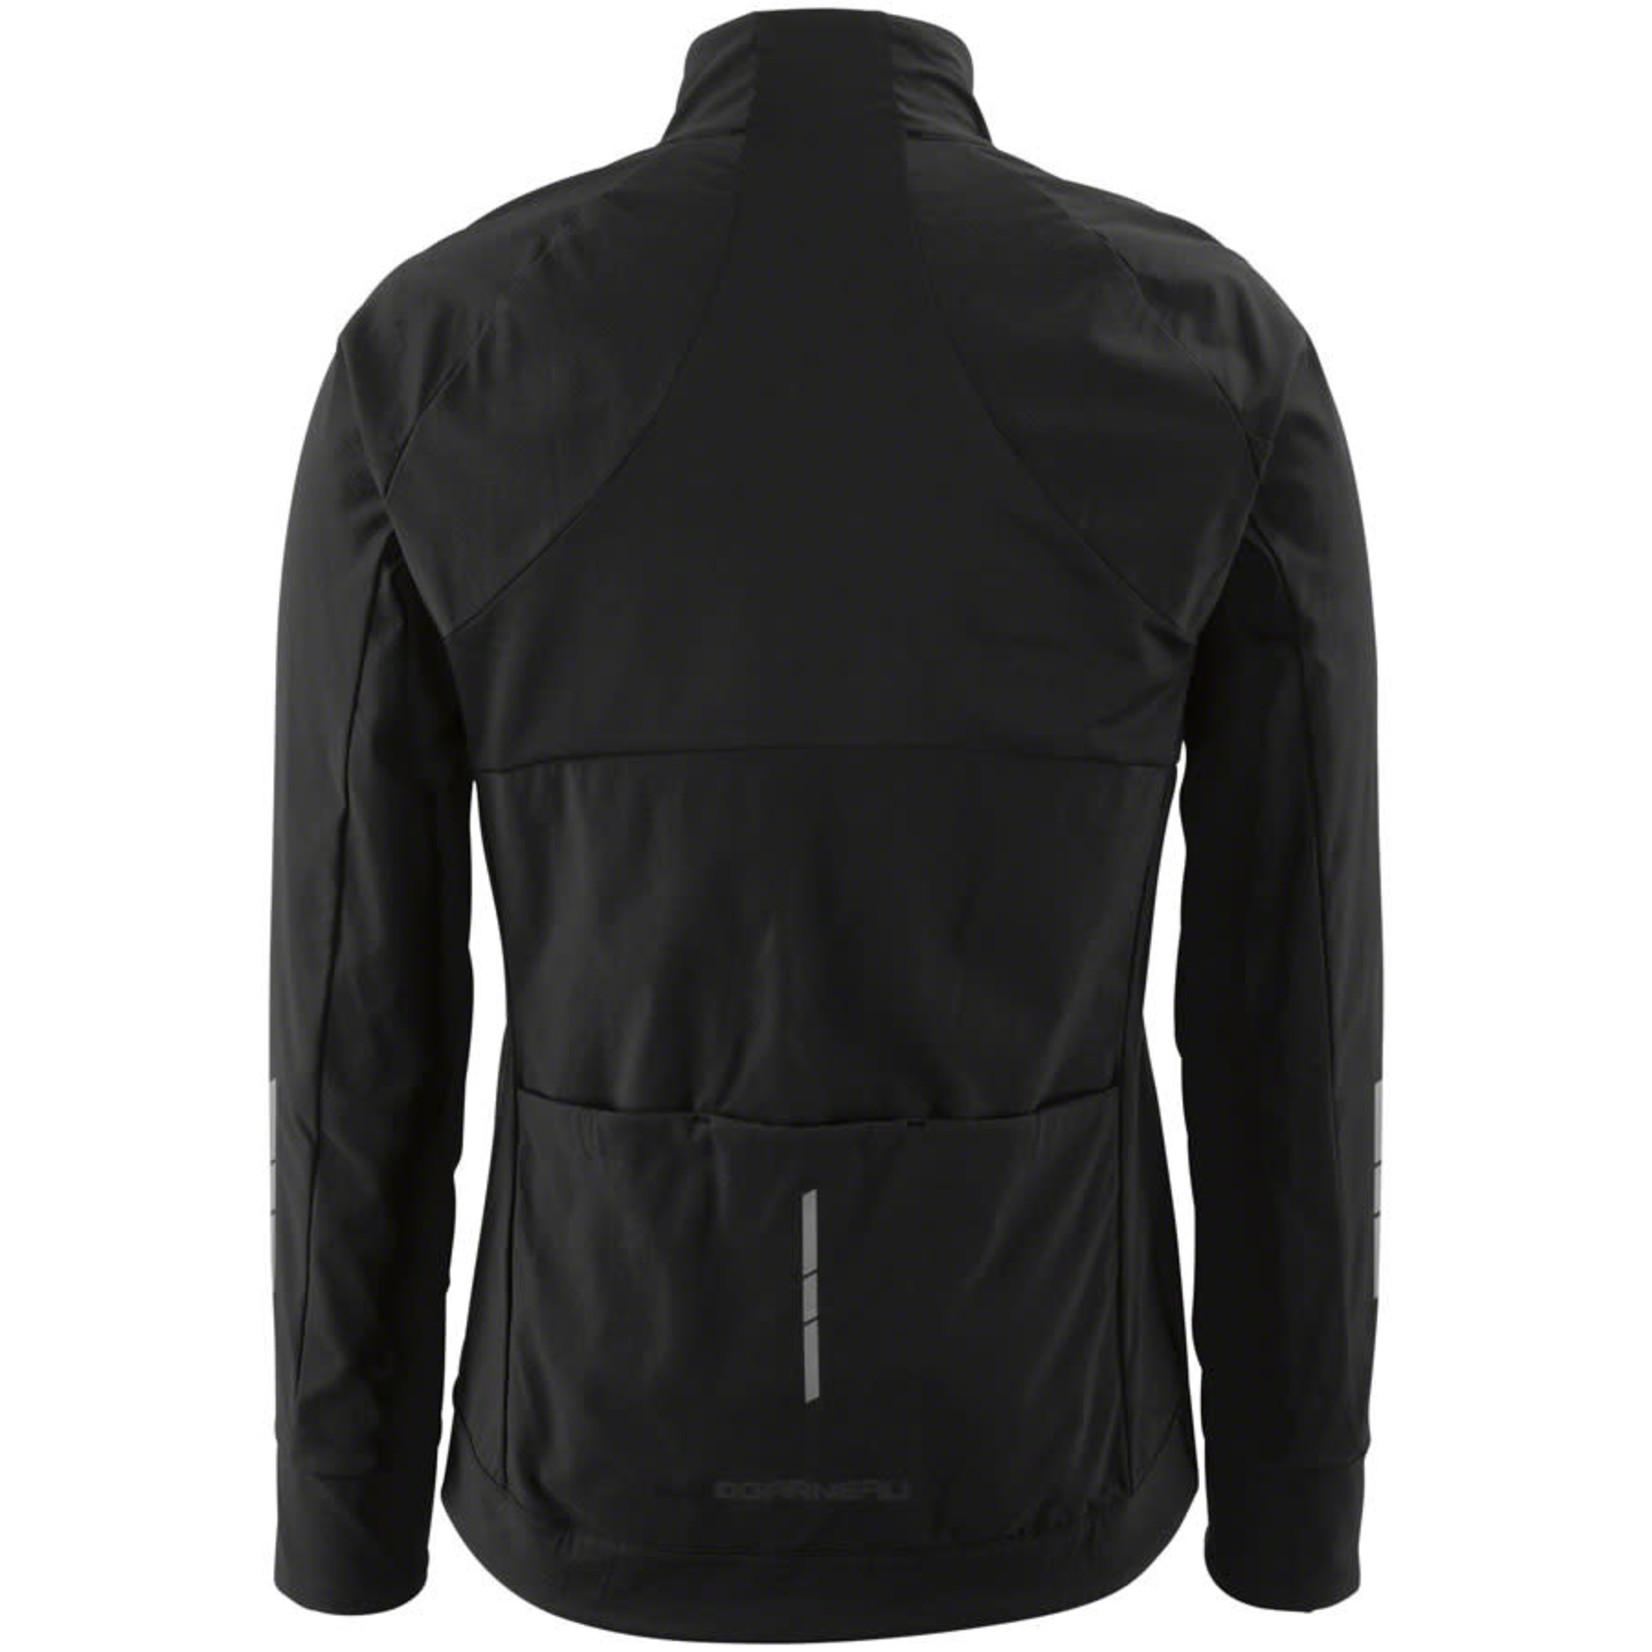 Garneau Dualistic Men's Jacket